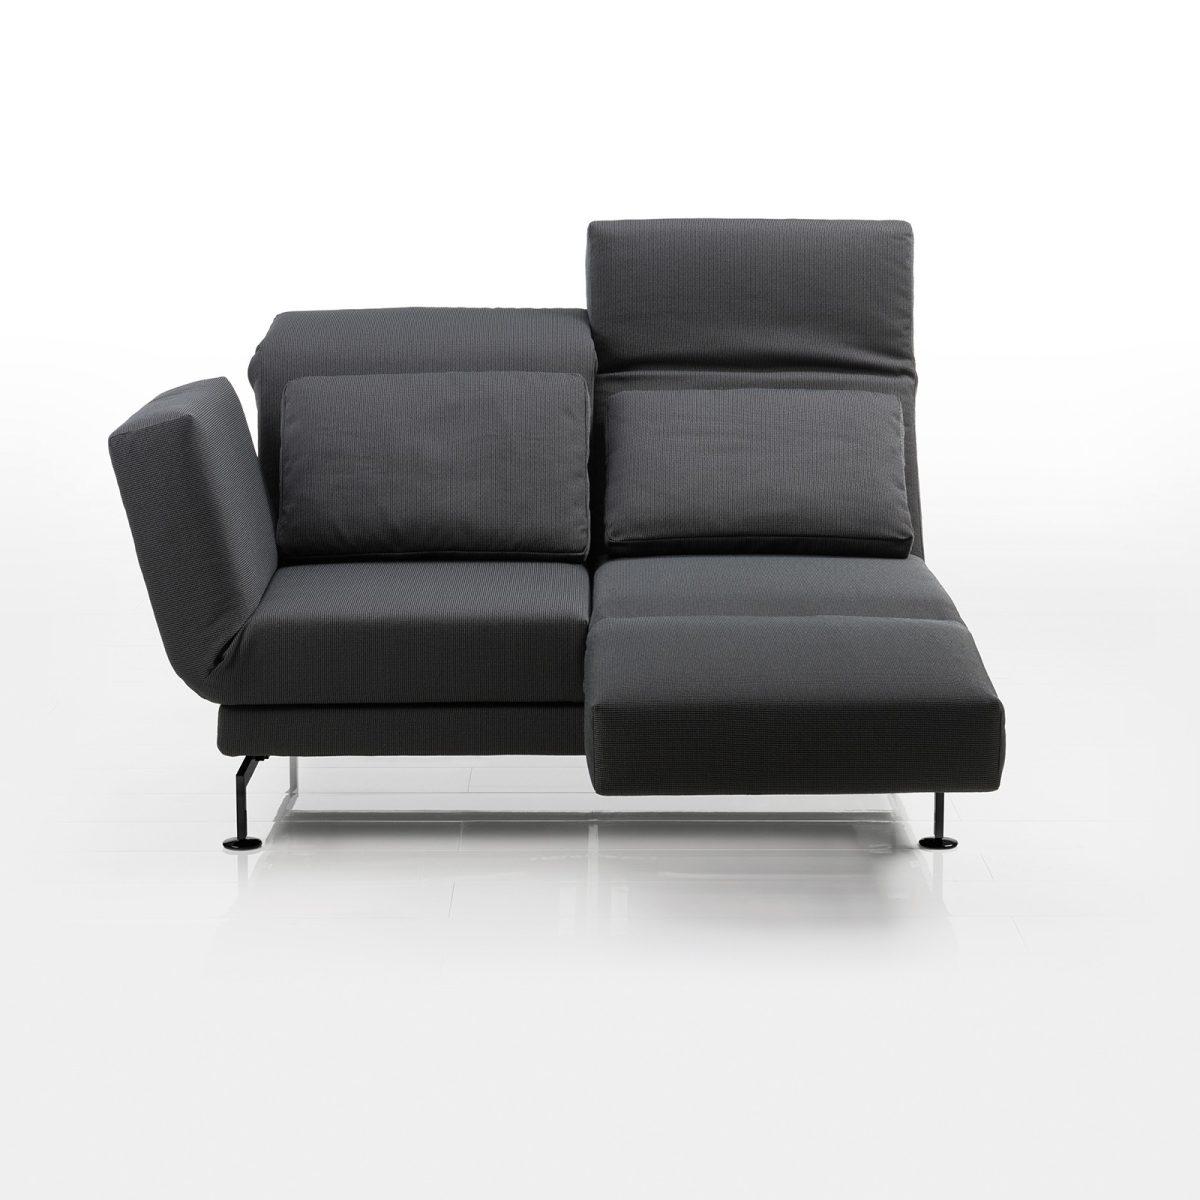 Sofa Moule small Bruehl Funktionssofa Schlafsofa Stoff Online Kaufen